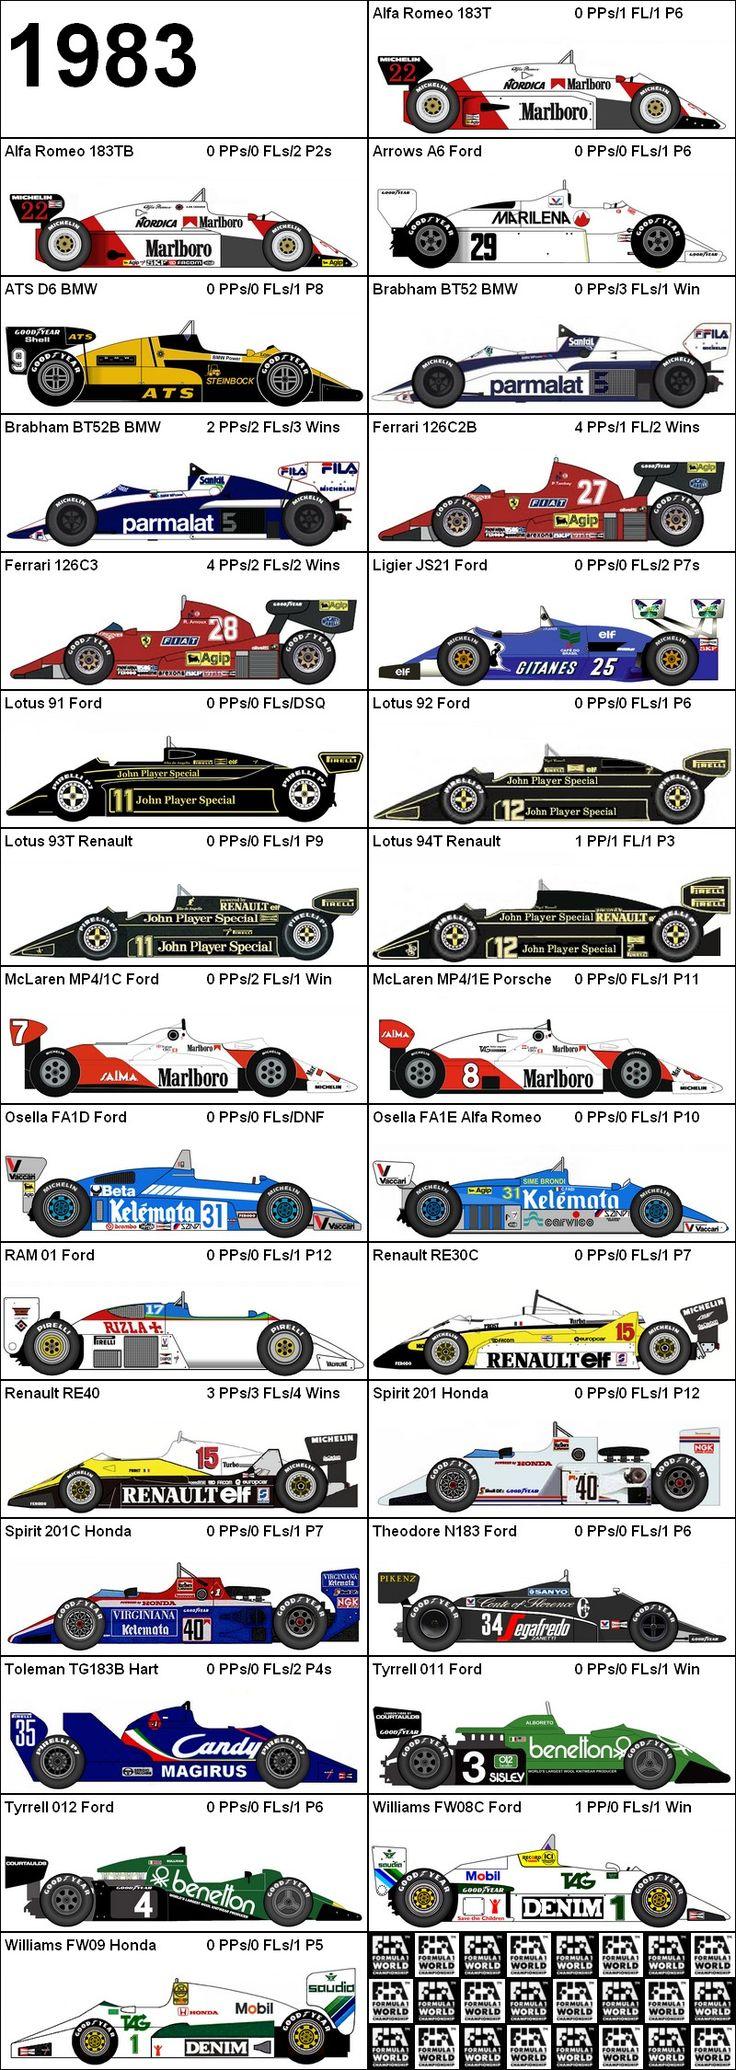 Formula One Grand Prix 1983 Cars